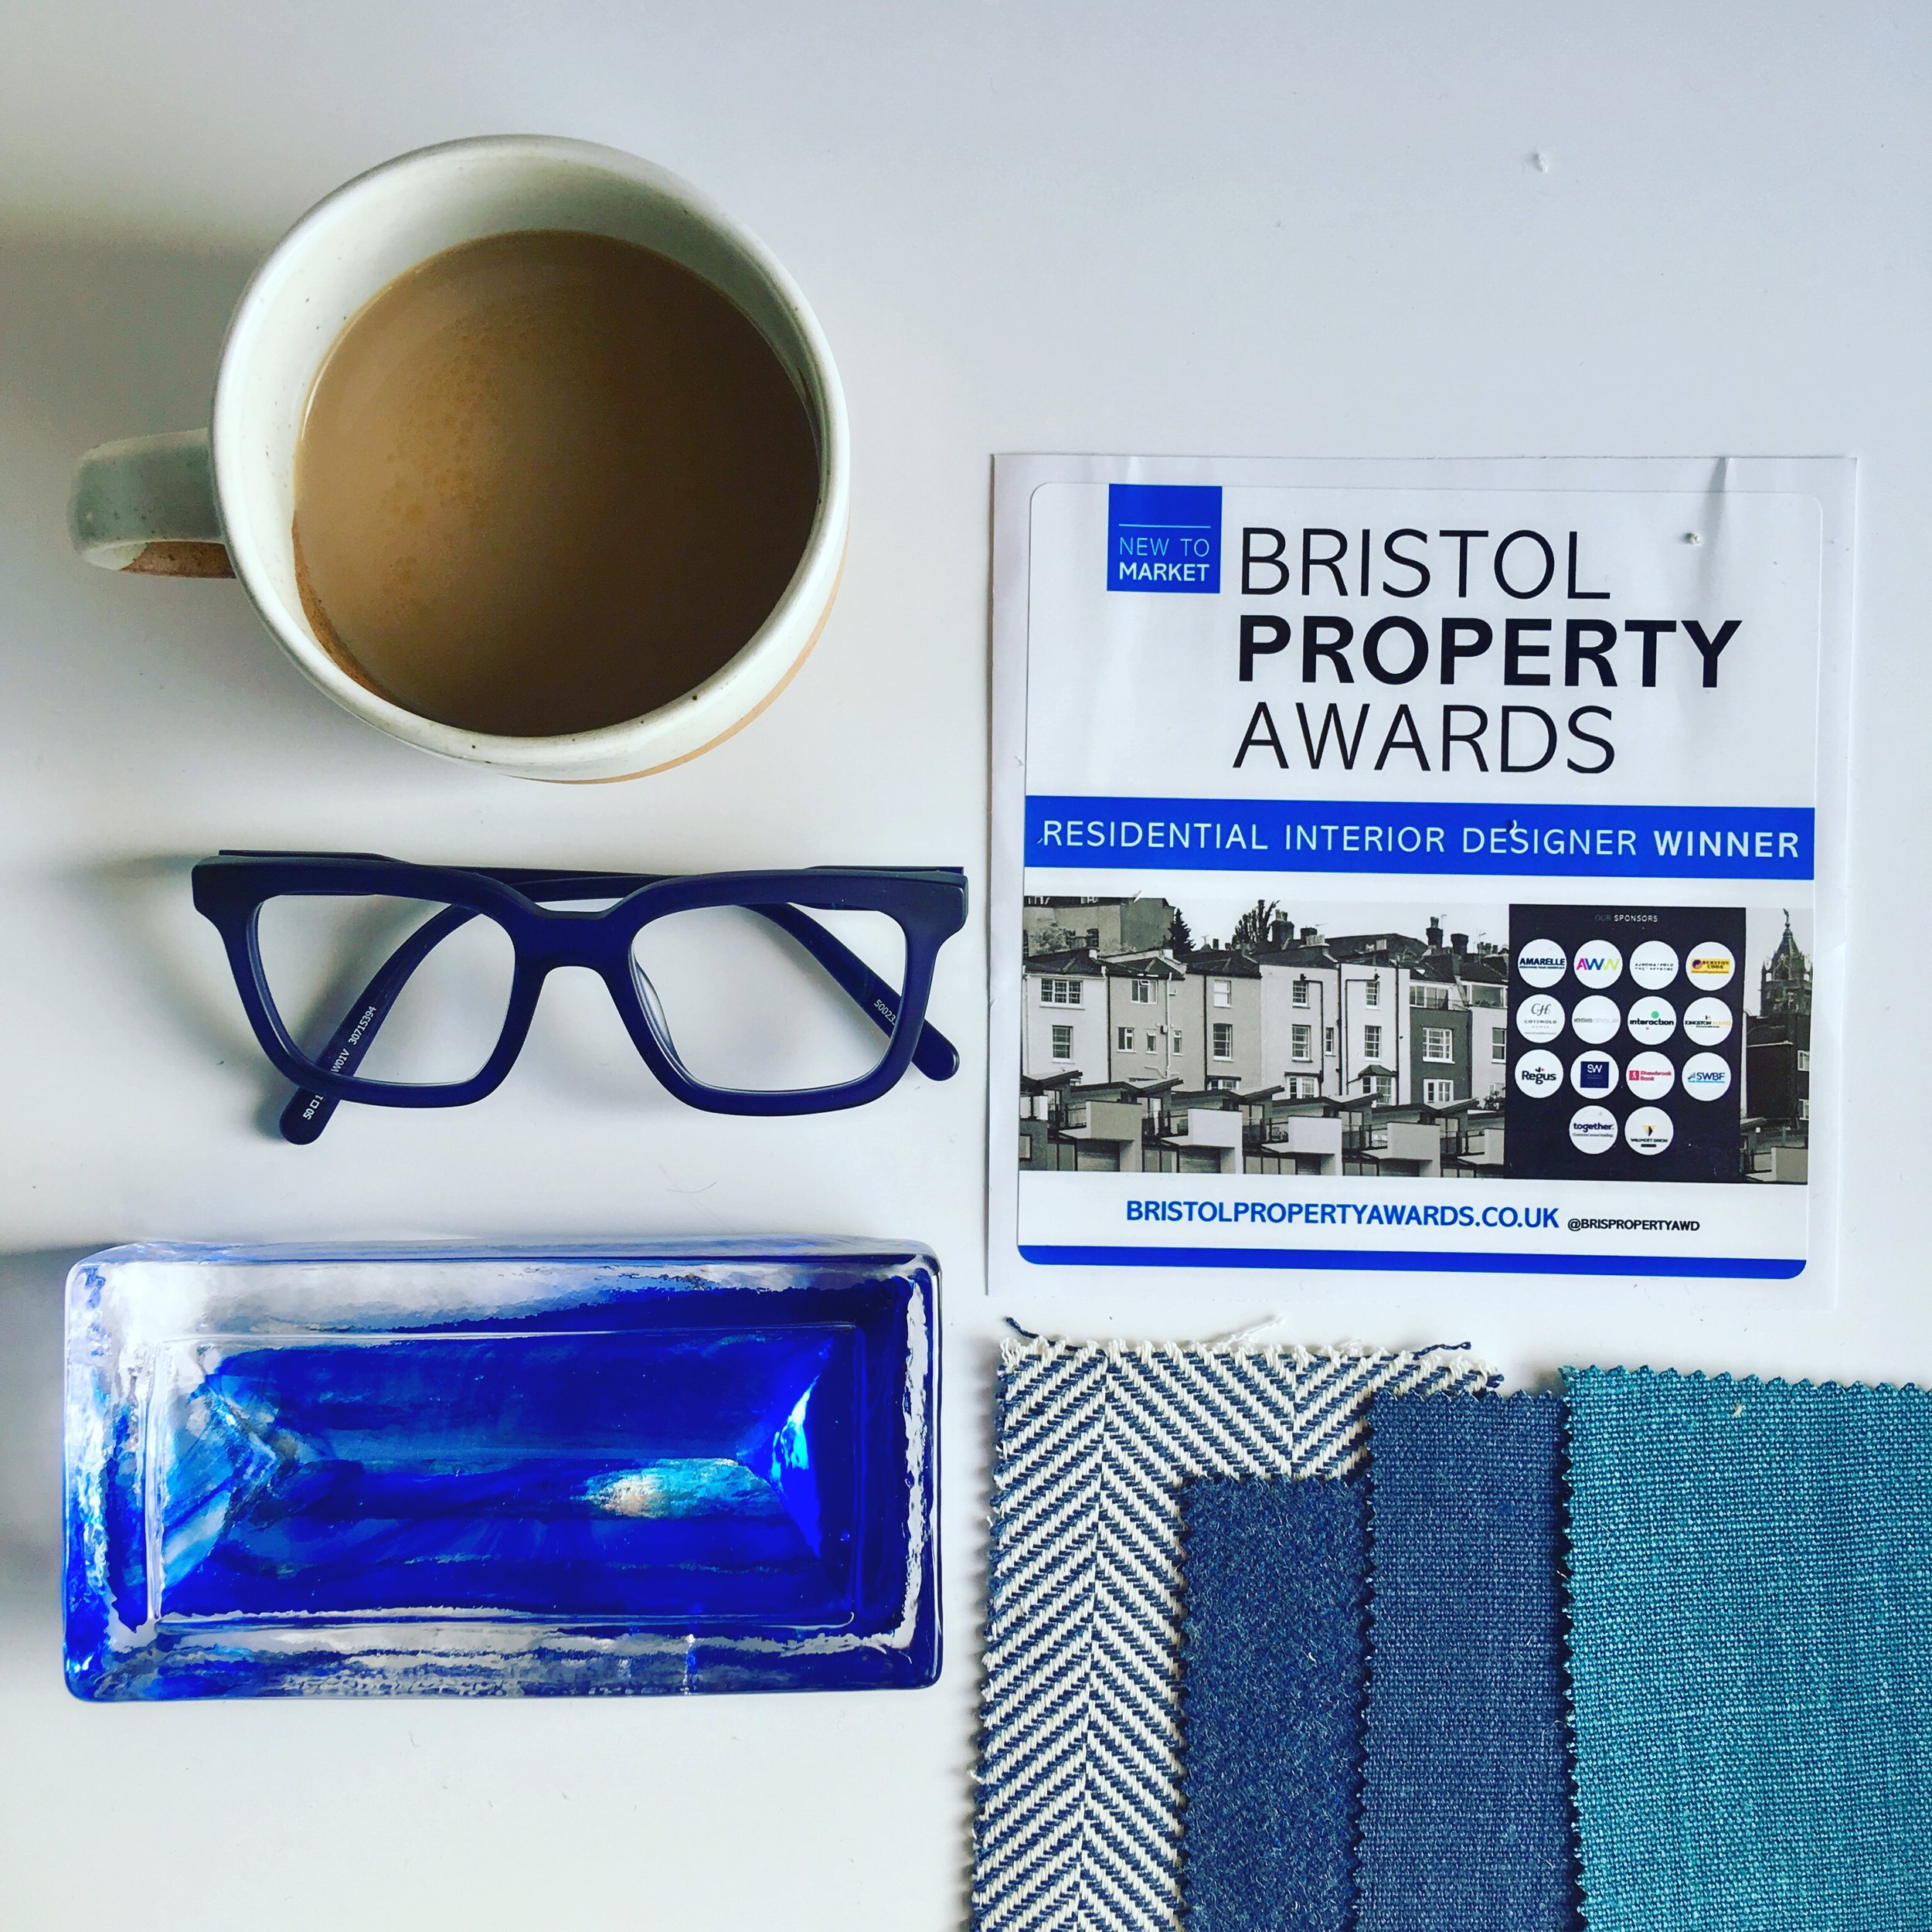 Bristol Property Awards 2019.JPG